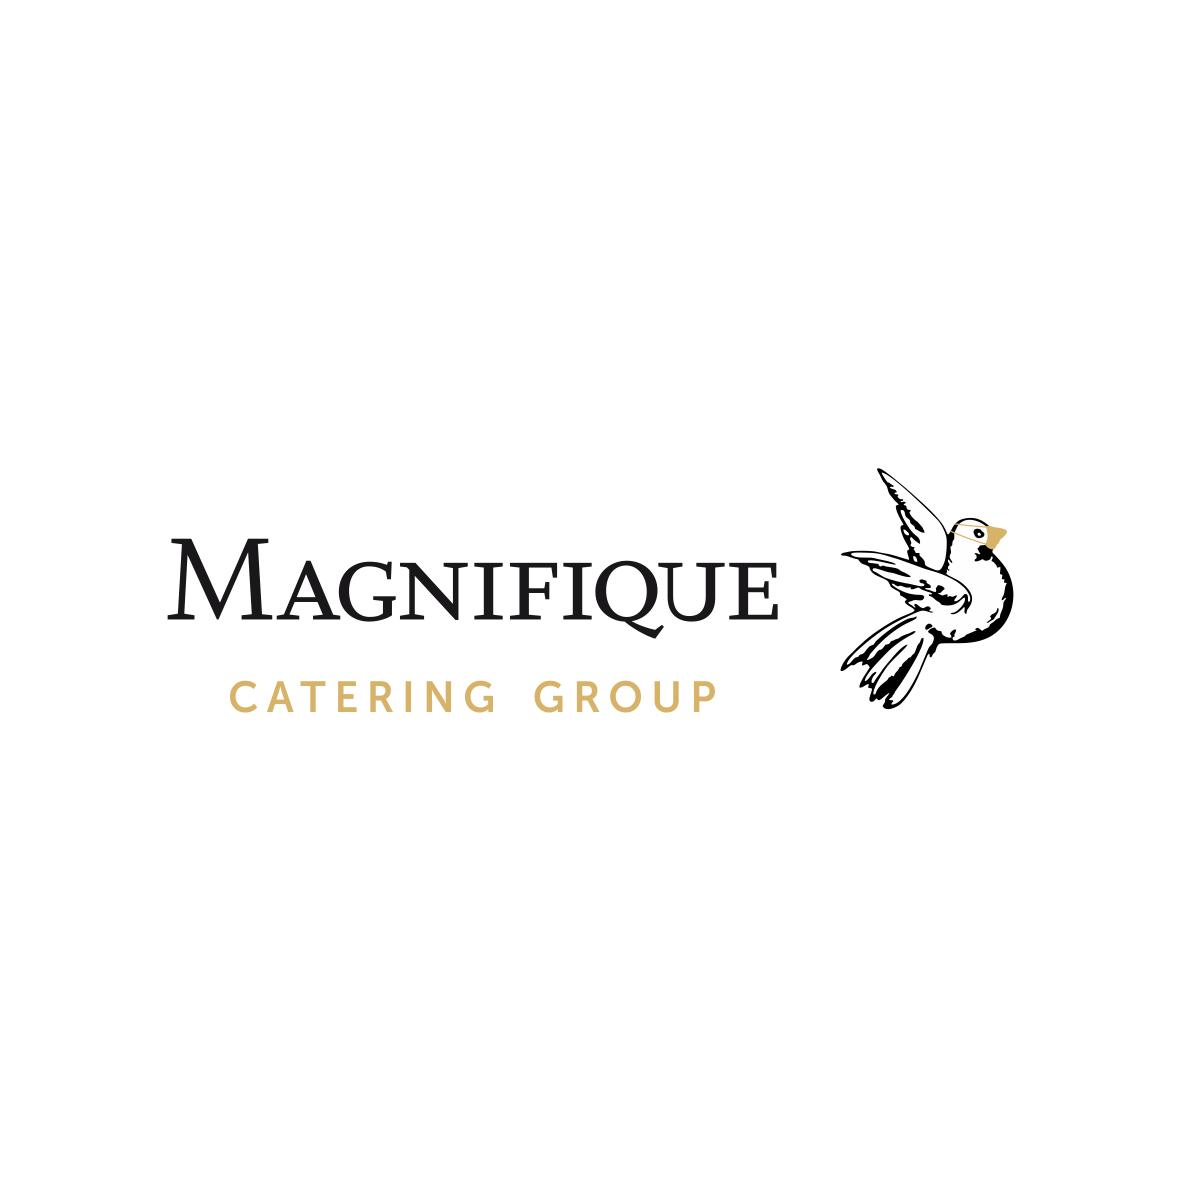 Безопасная доставка обедов от Magnifique Catering